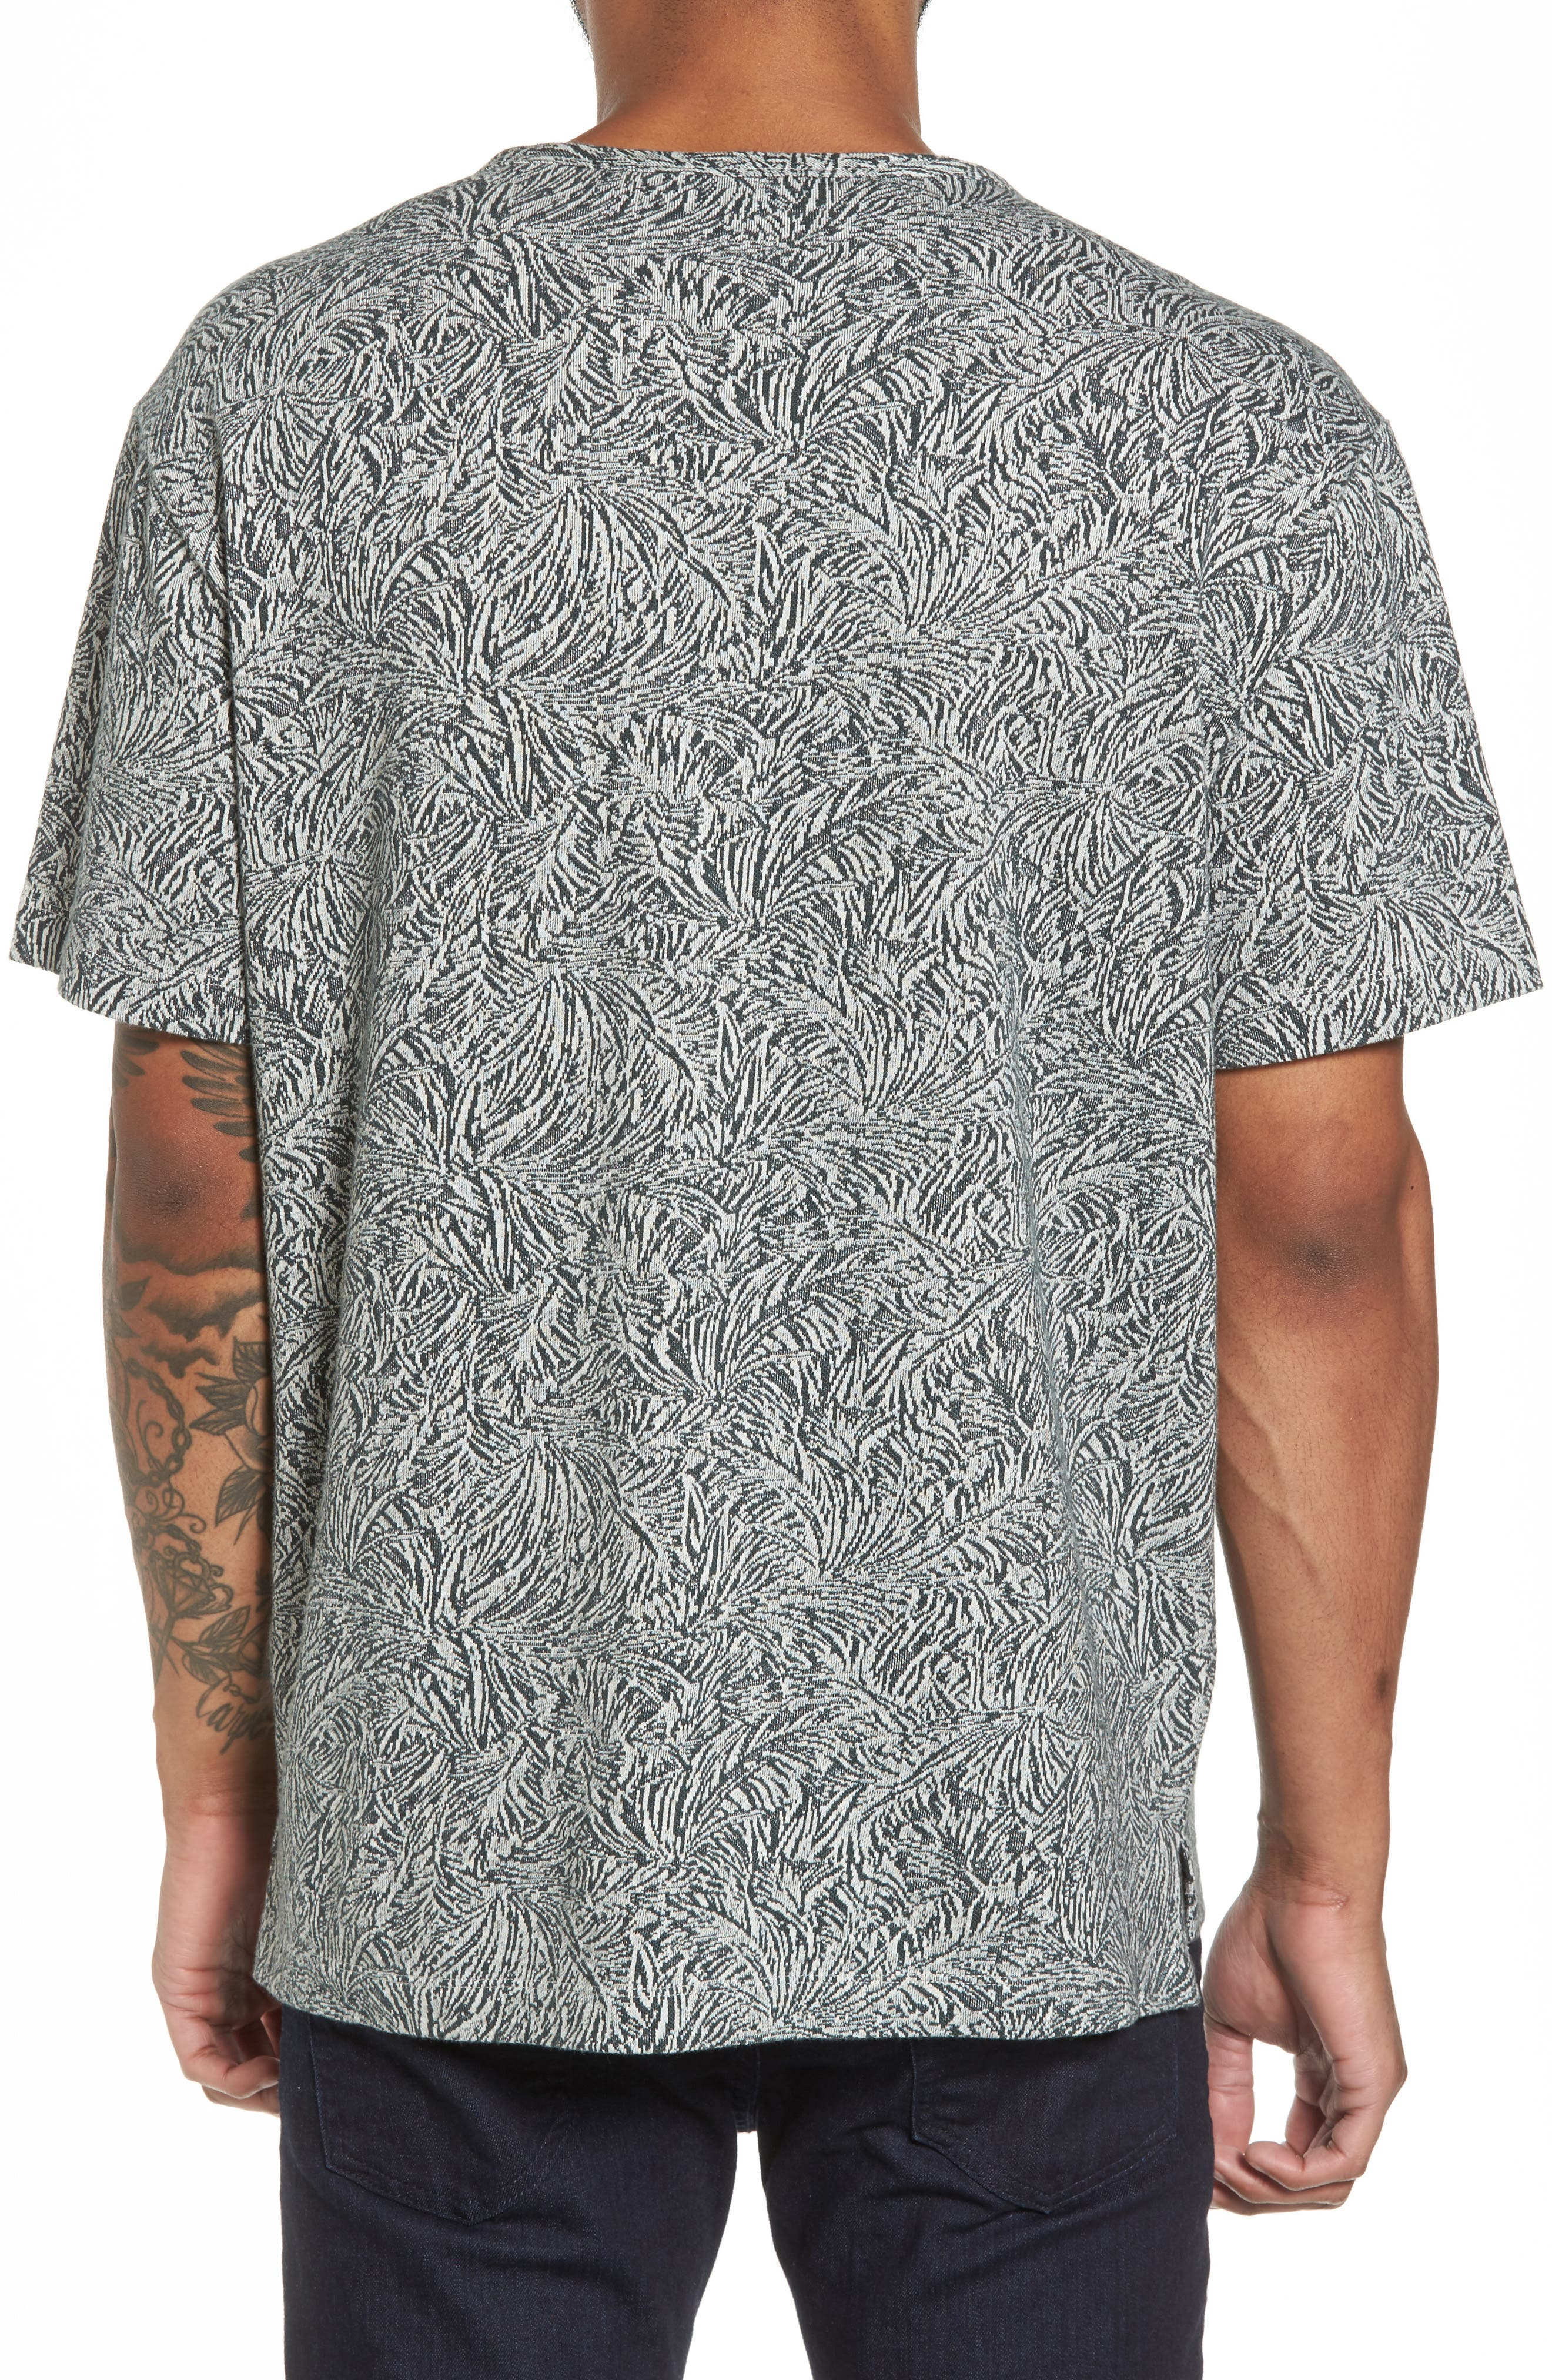 Palm Jacquard Crewneck T-Shirt,                             Alternate thumbnail 2, color,                             177